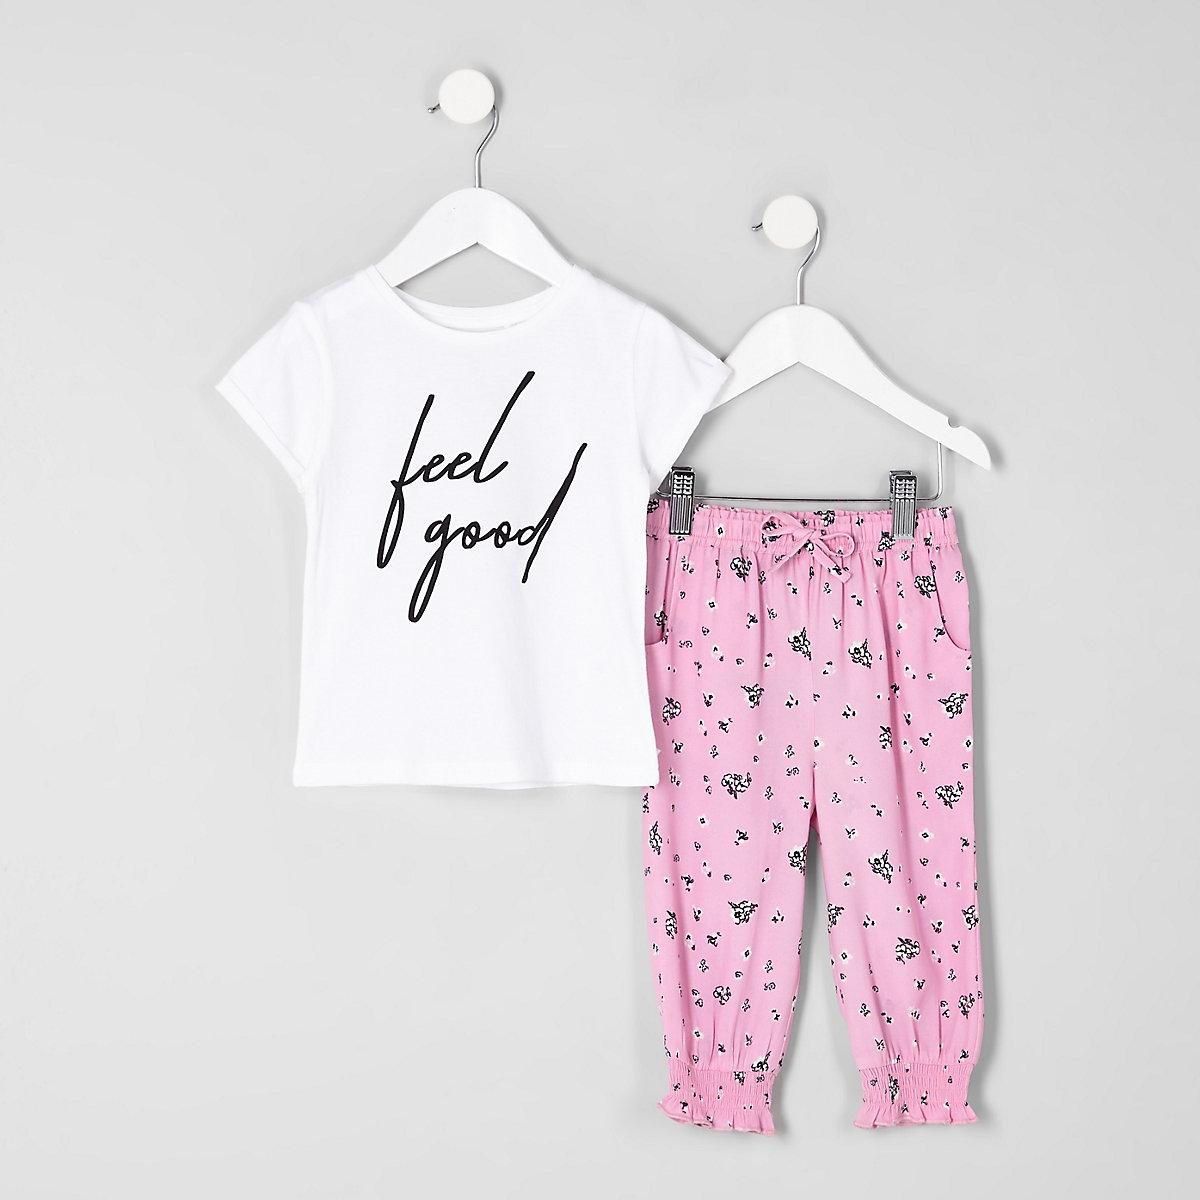 Mini girls white 'feel good' T-shirt outfit